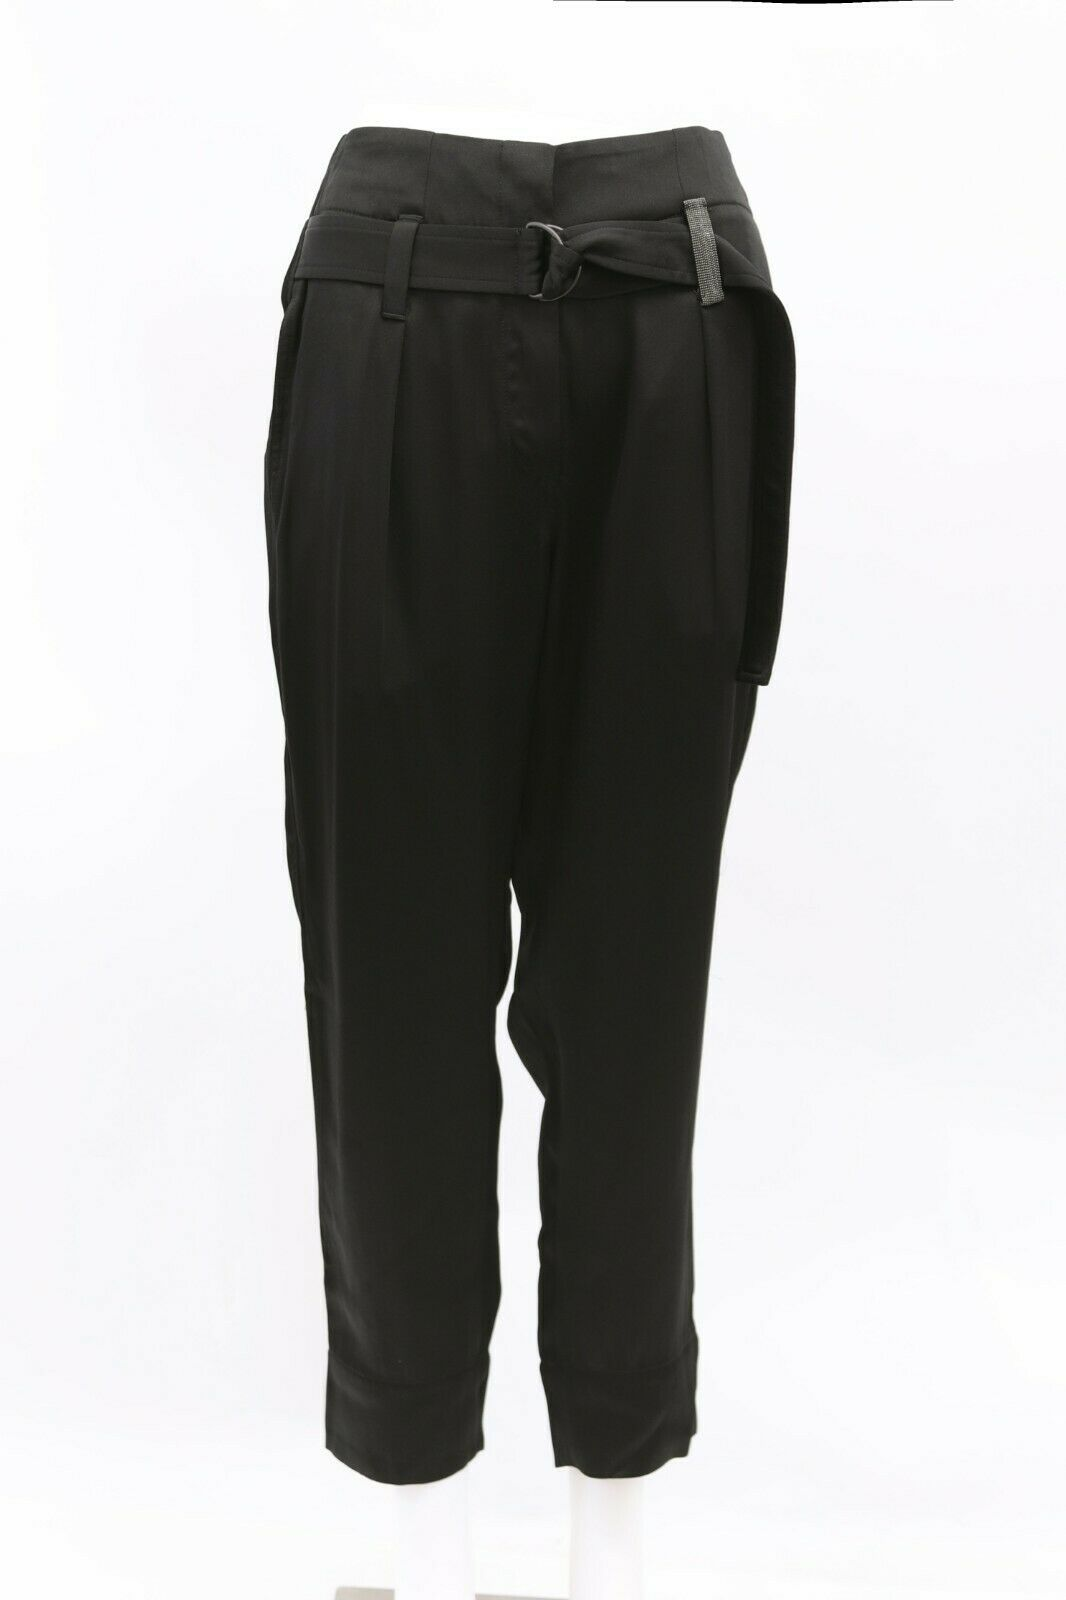 NWT 1425 Brunello Cucinelli damen Satin Bead Dress Pant W Cinch Belt 42 6US A186